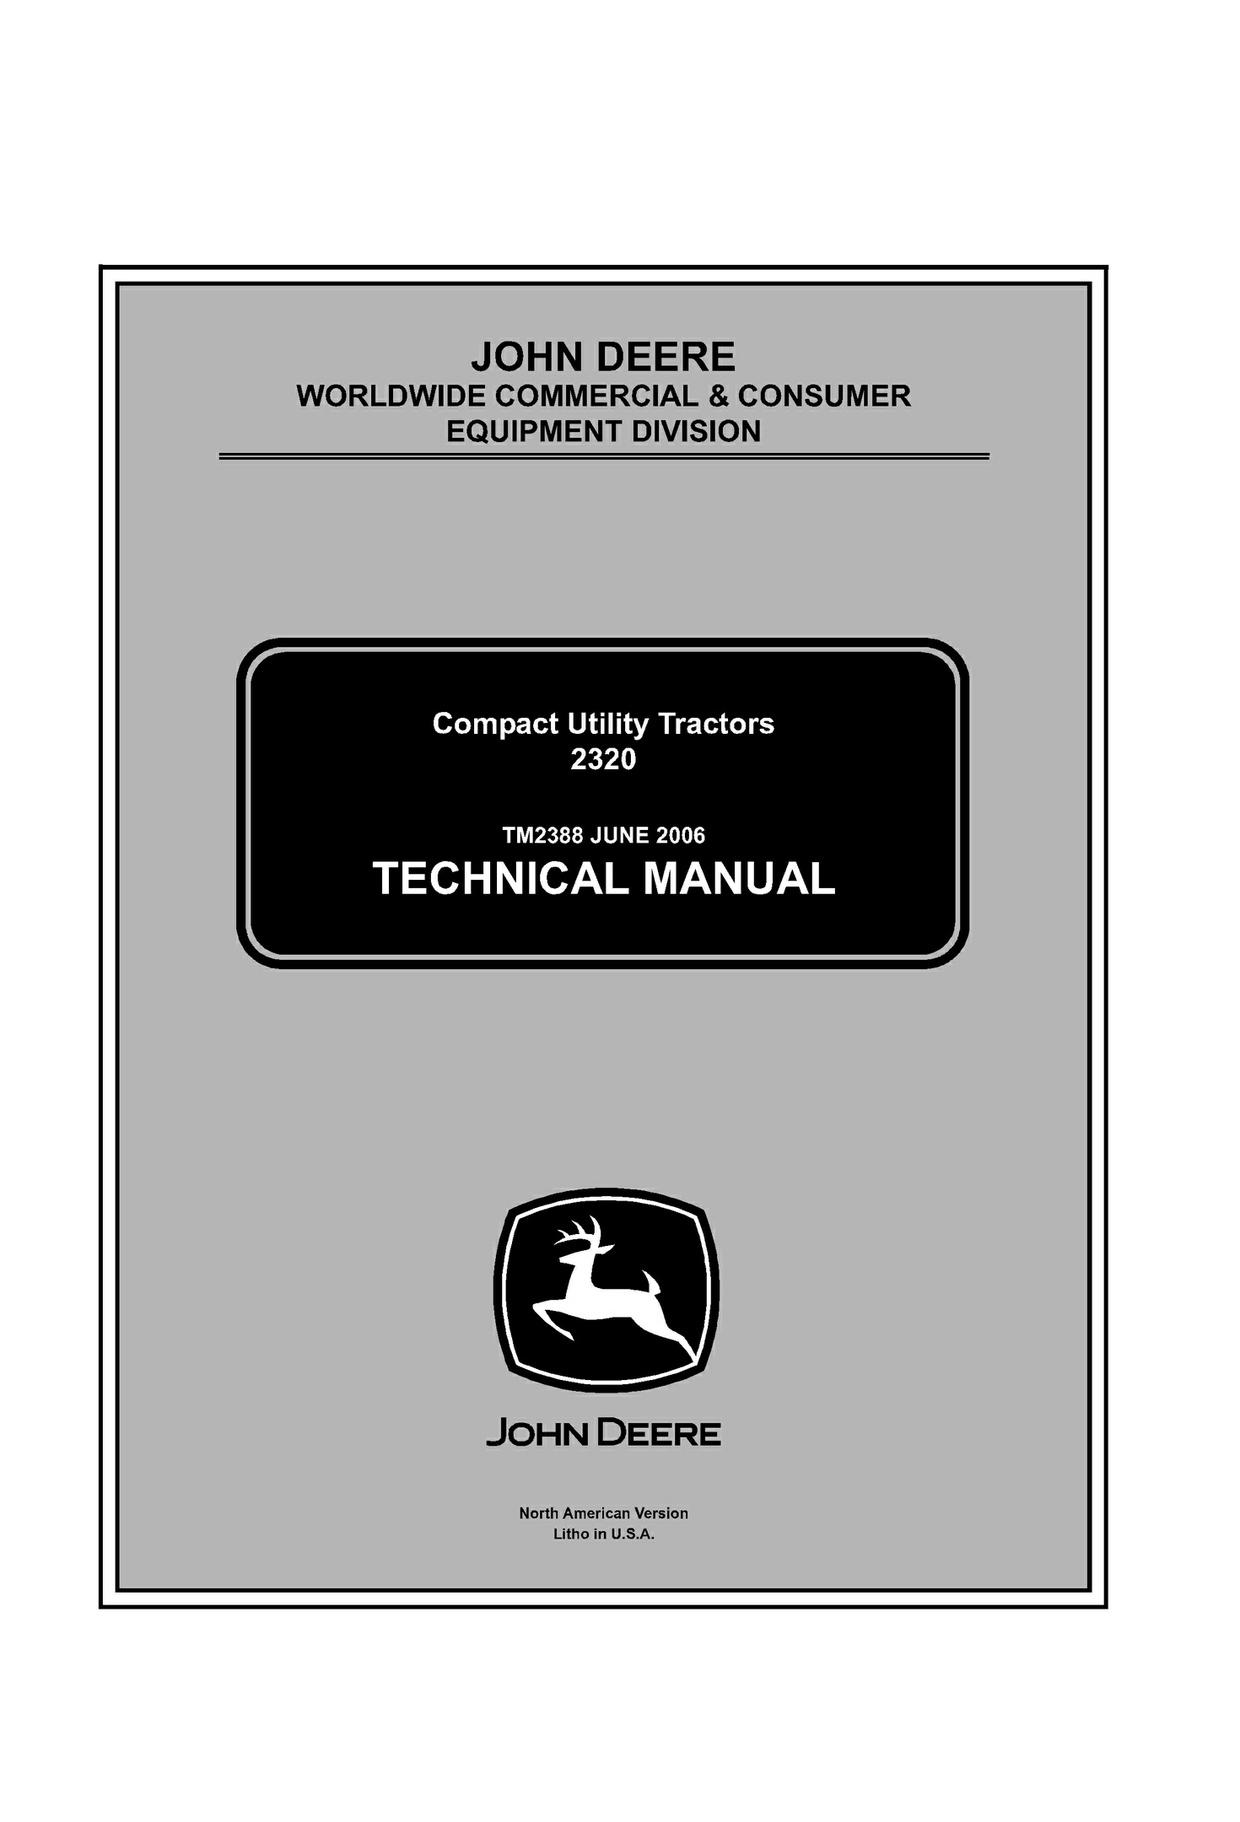 Download John Deere 2320 Compact Utility Tractor Service  Manual TM2388